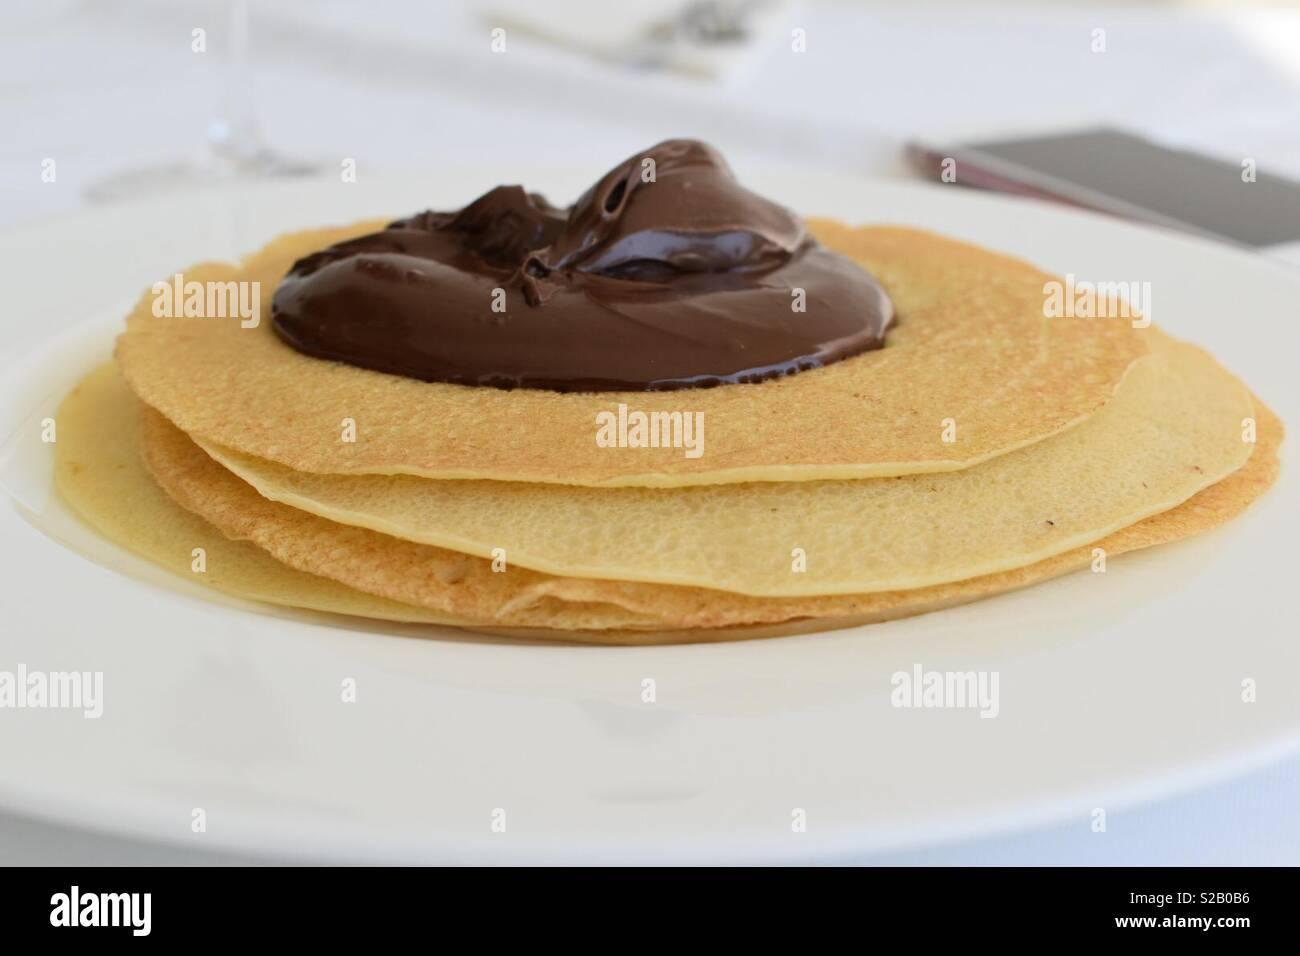 Nutella & Pancakes - Stock Image